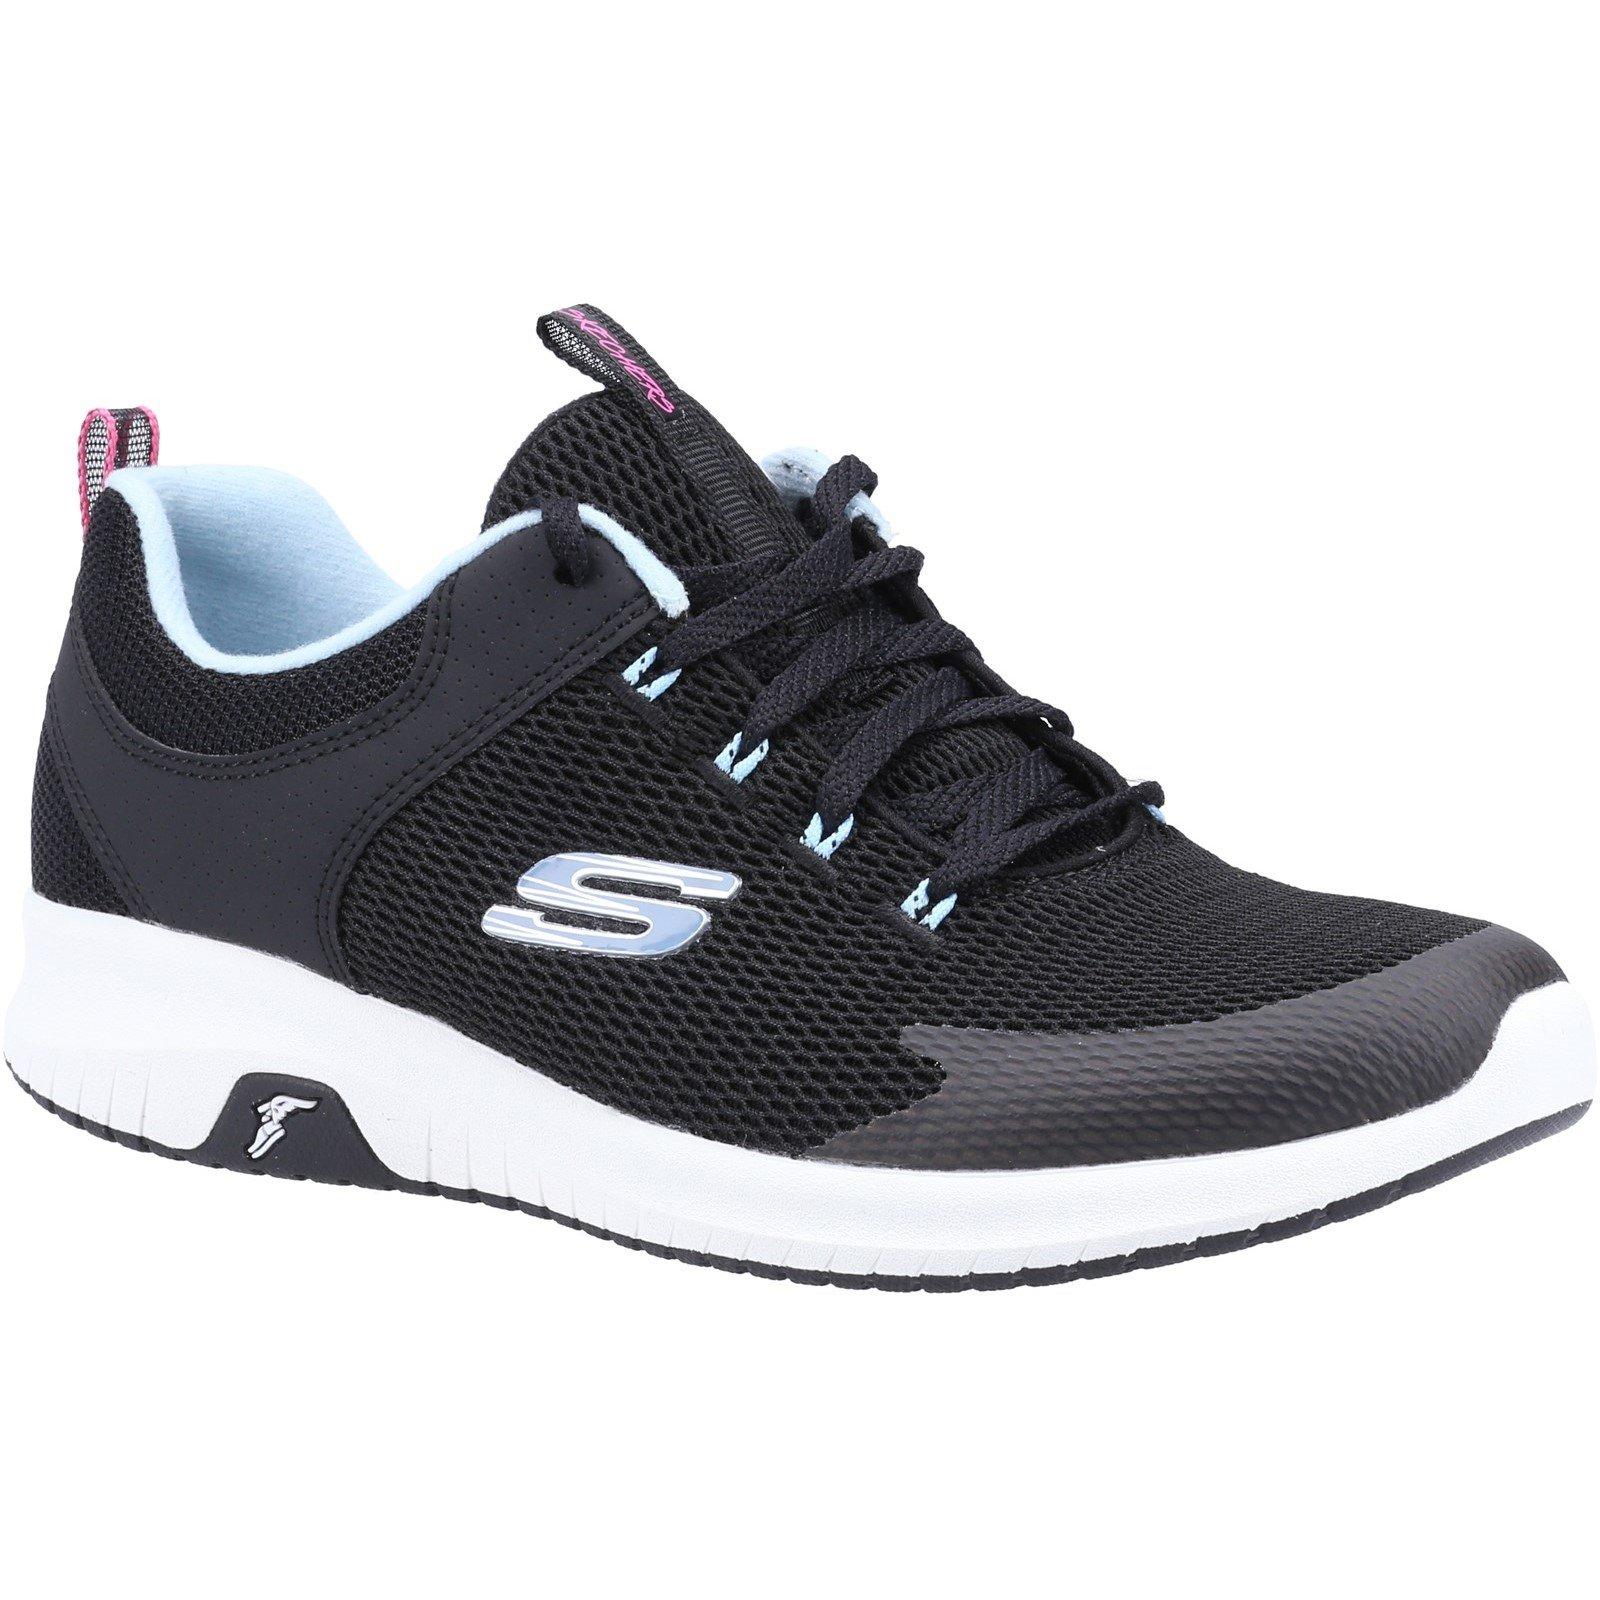 Skechers Women's Ultra Flex Prime Step Out Trainer Multicolor 32112 - Black/Light Blue 6